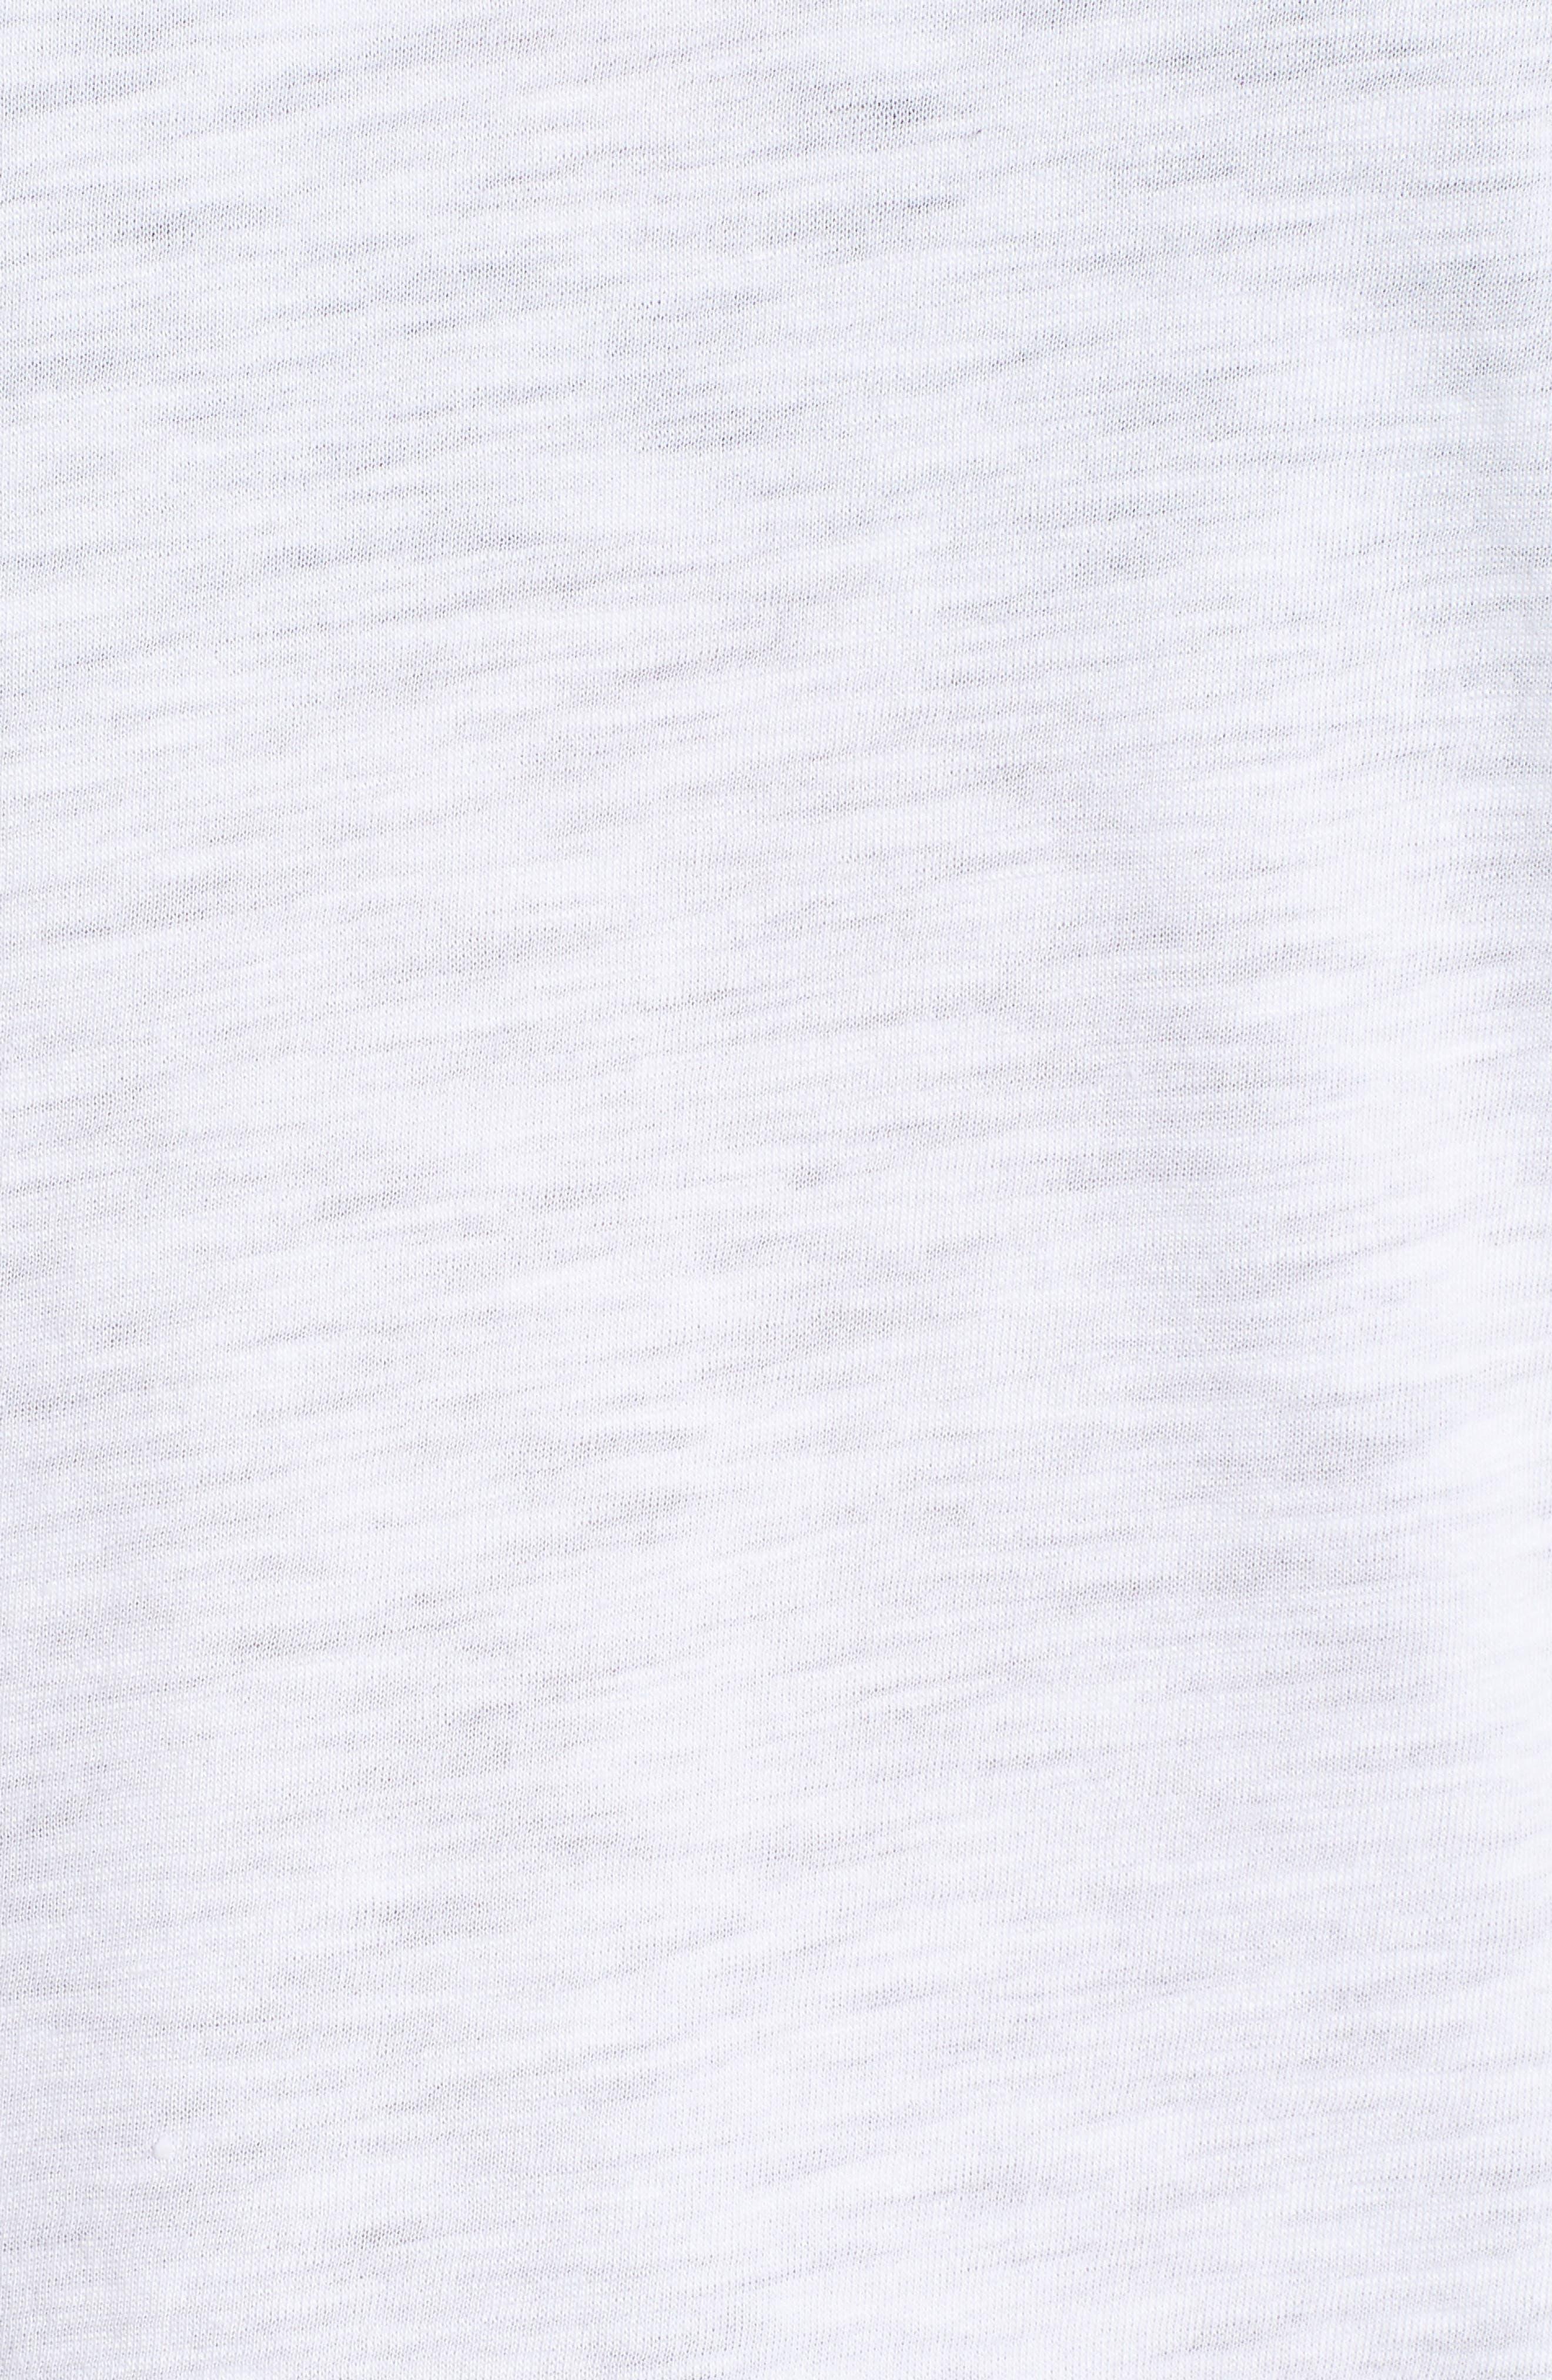 GIBSON, x Hi Sugarplum! Malibu Embroidered Racerback Tank Top, Alternate thumbnail 5, color, WHITE W/ BLACK/ WHITE